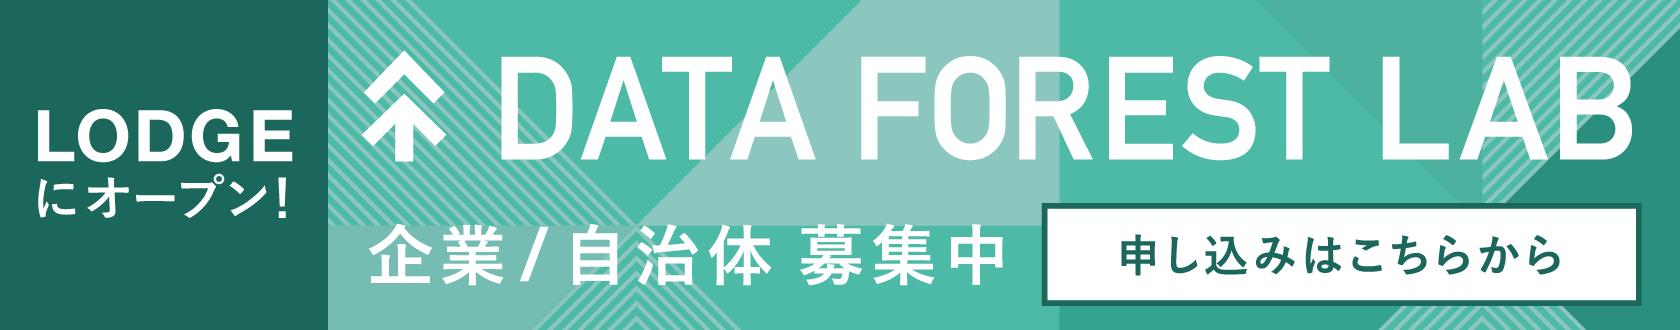 LODGEにオープン 企業/自治体募集中 DATA FOREST LAB